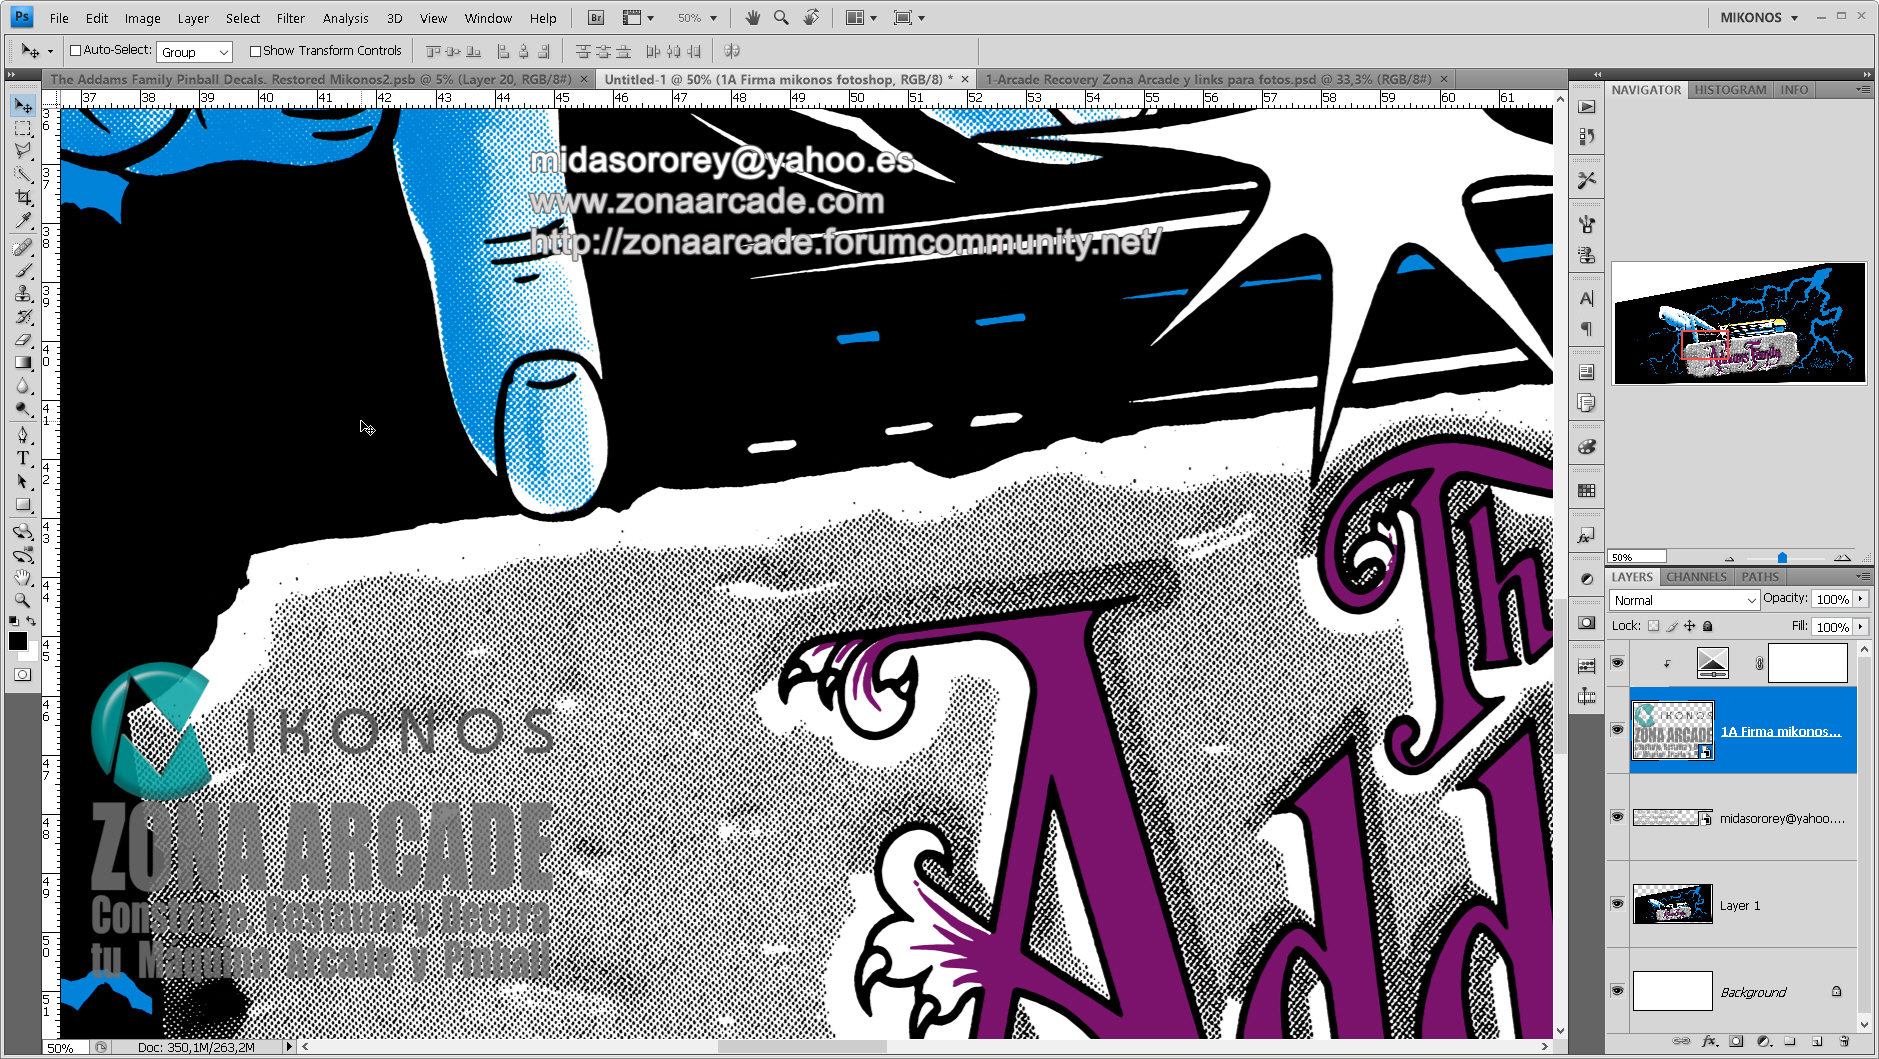 The-Addams-Family-Left-Side-Art-Pinball-Decal.-Restored-Mikonos3.jpg